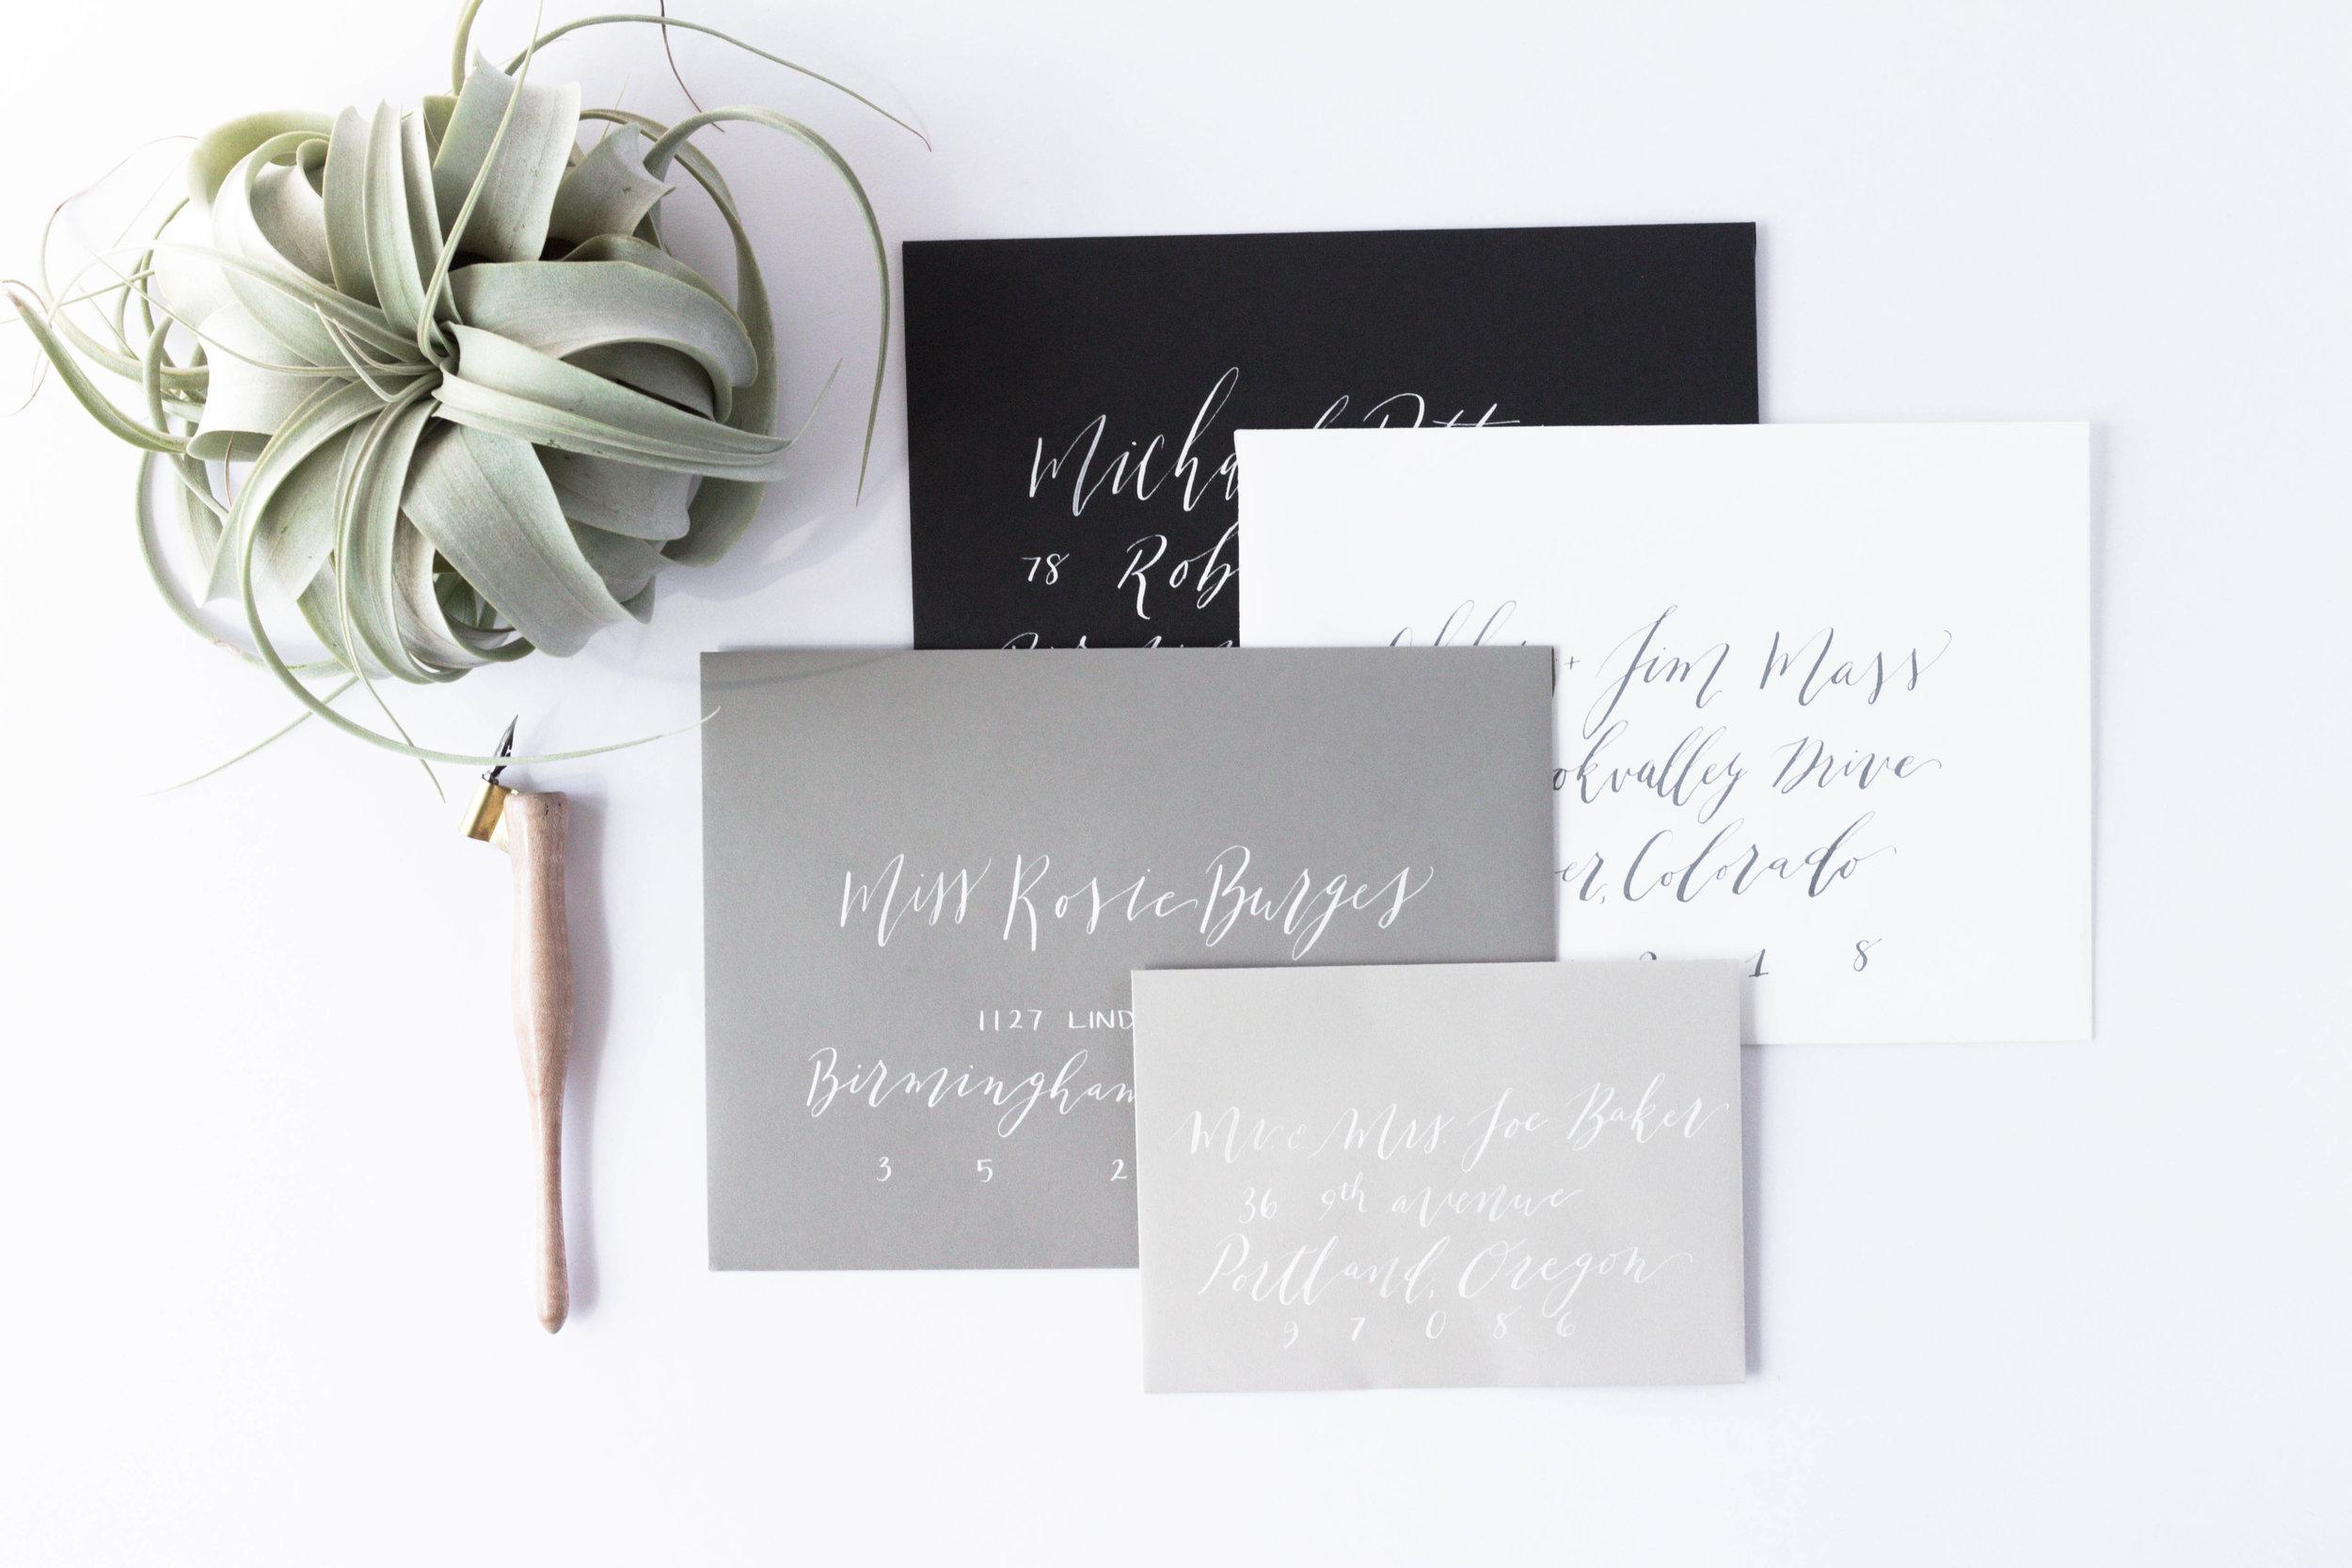 Calligraphy Envelope Addressing - Minimalist Wedding Details - Modern Calligraphy Envelope - True North Paper Co